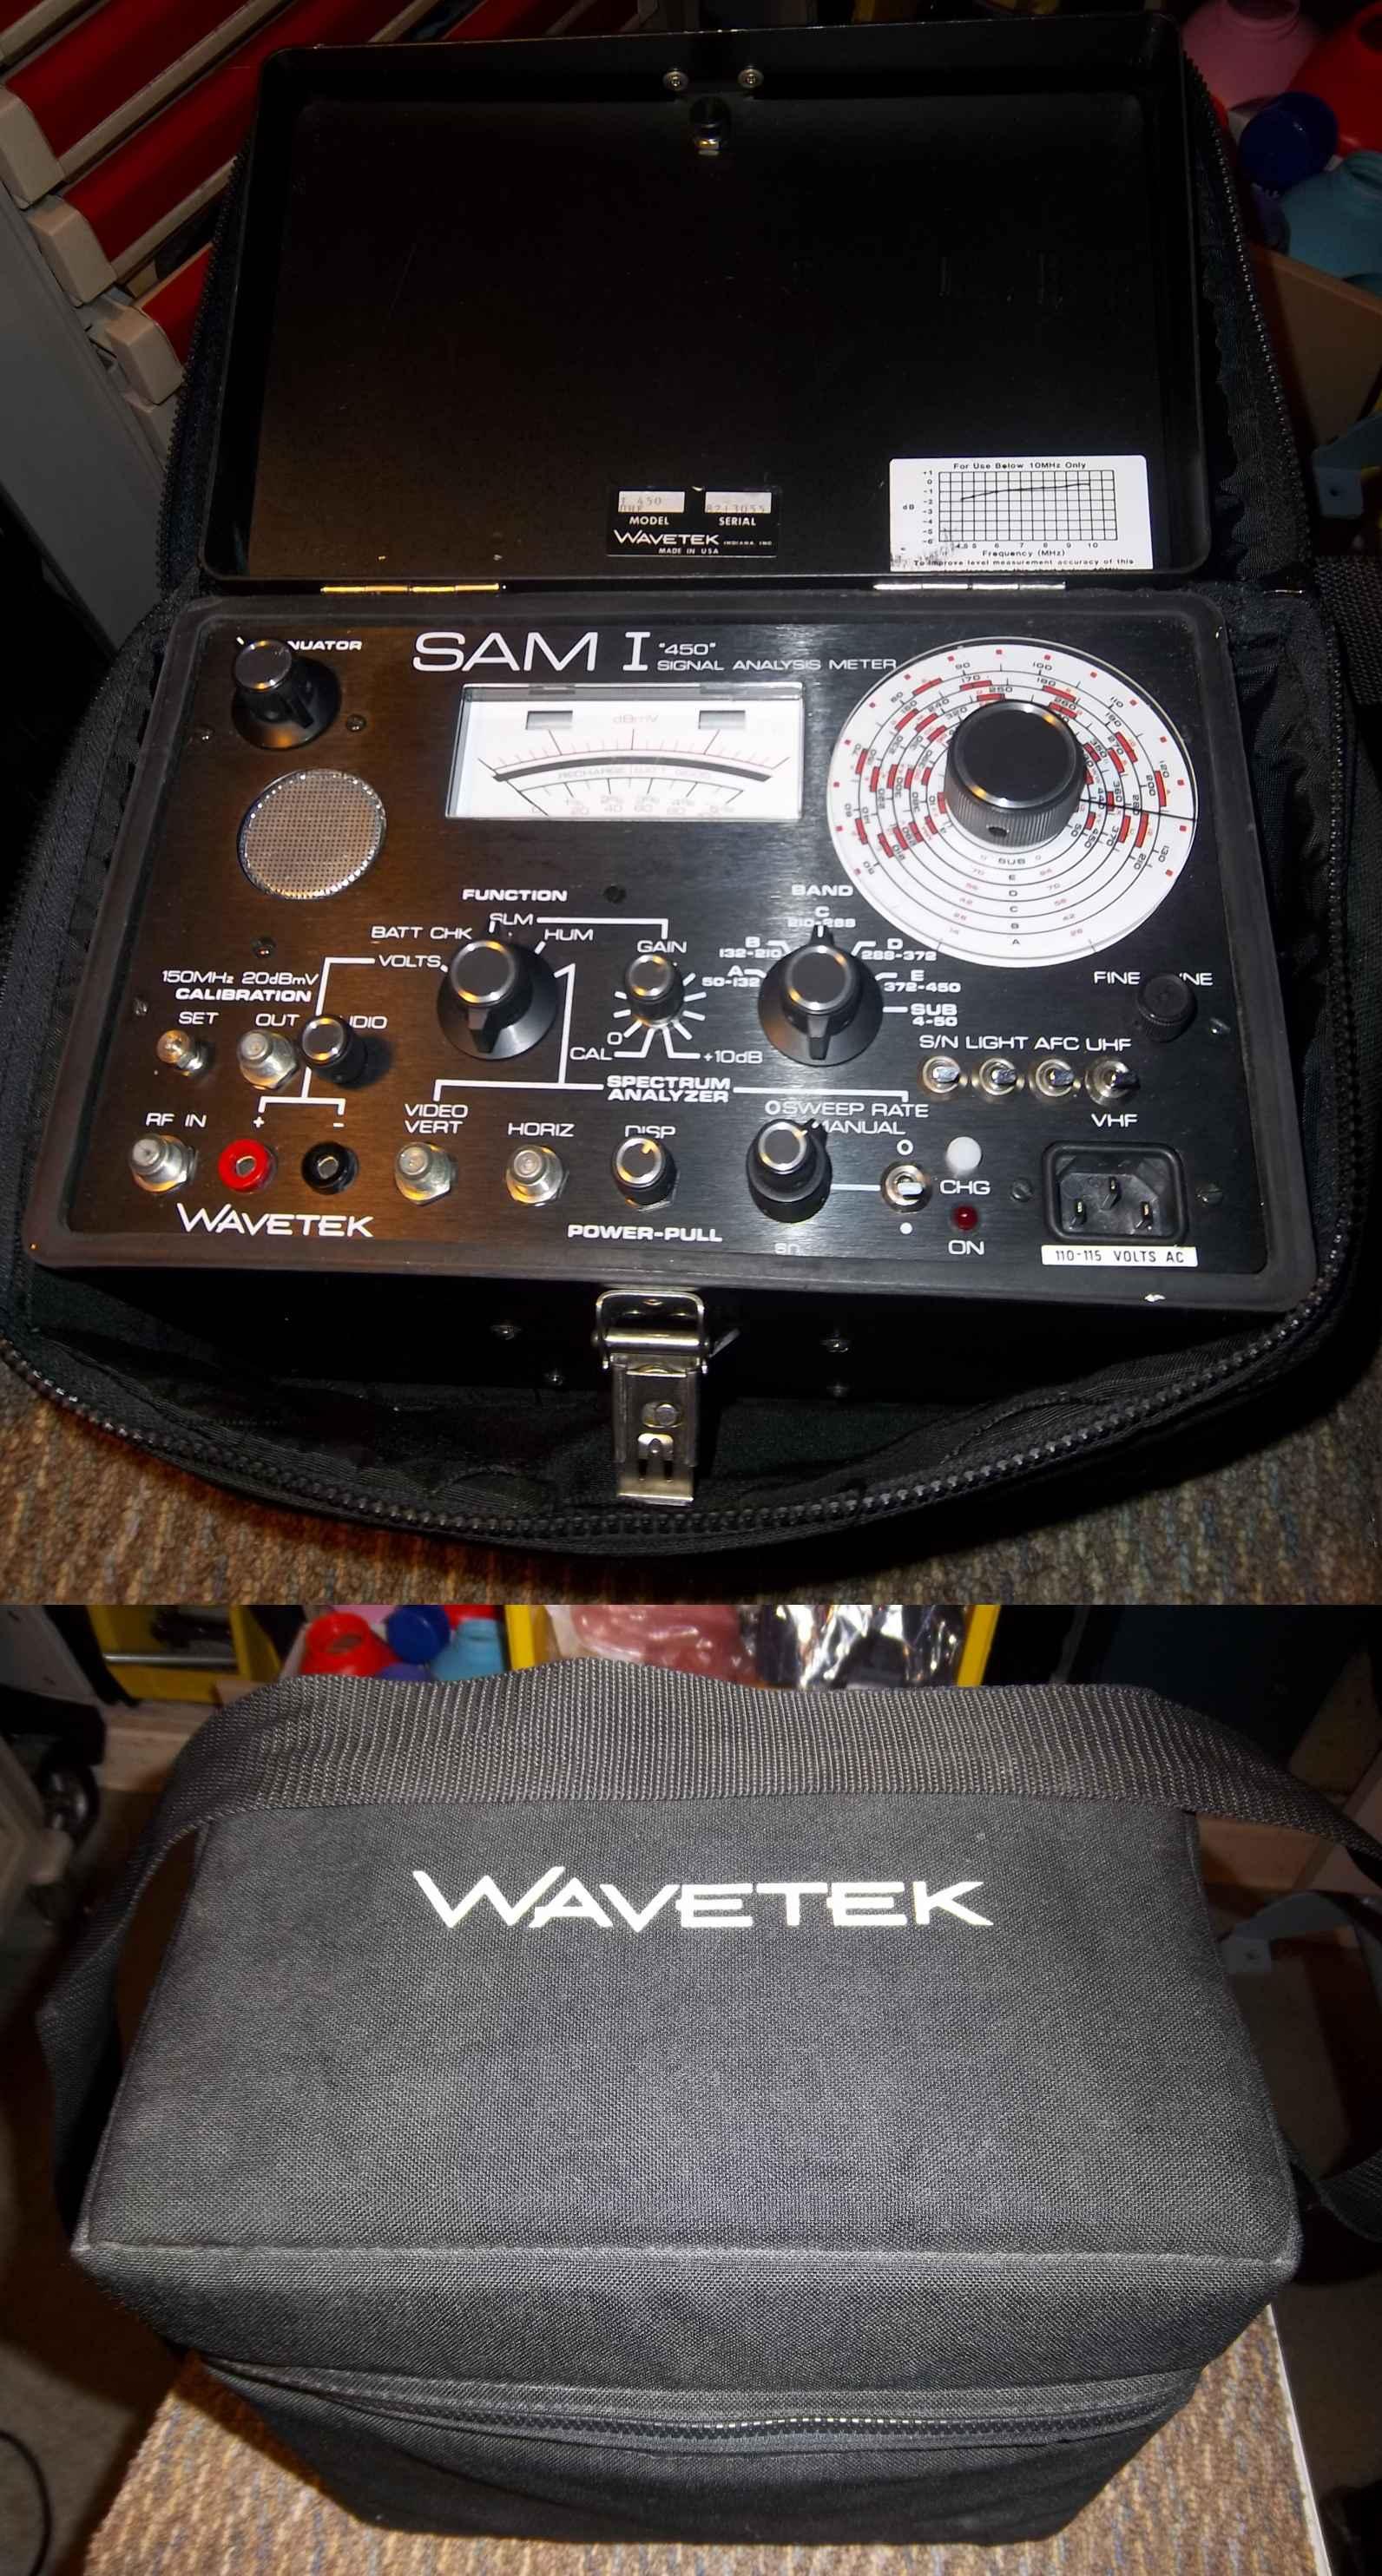 Wavetech Sam I Signal Analysis Meter - I 450UHF  meters wavetech Wavetech Sam1 Signal Analysis Meter - I450UHF